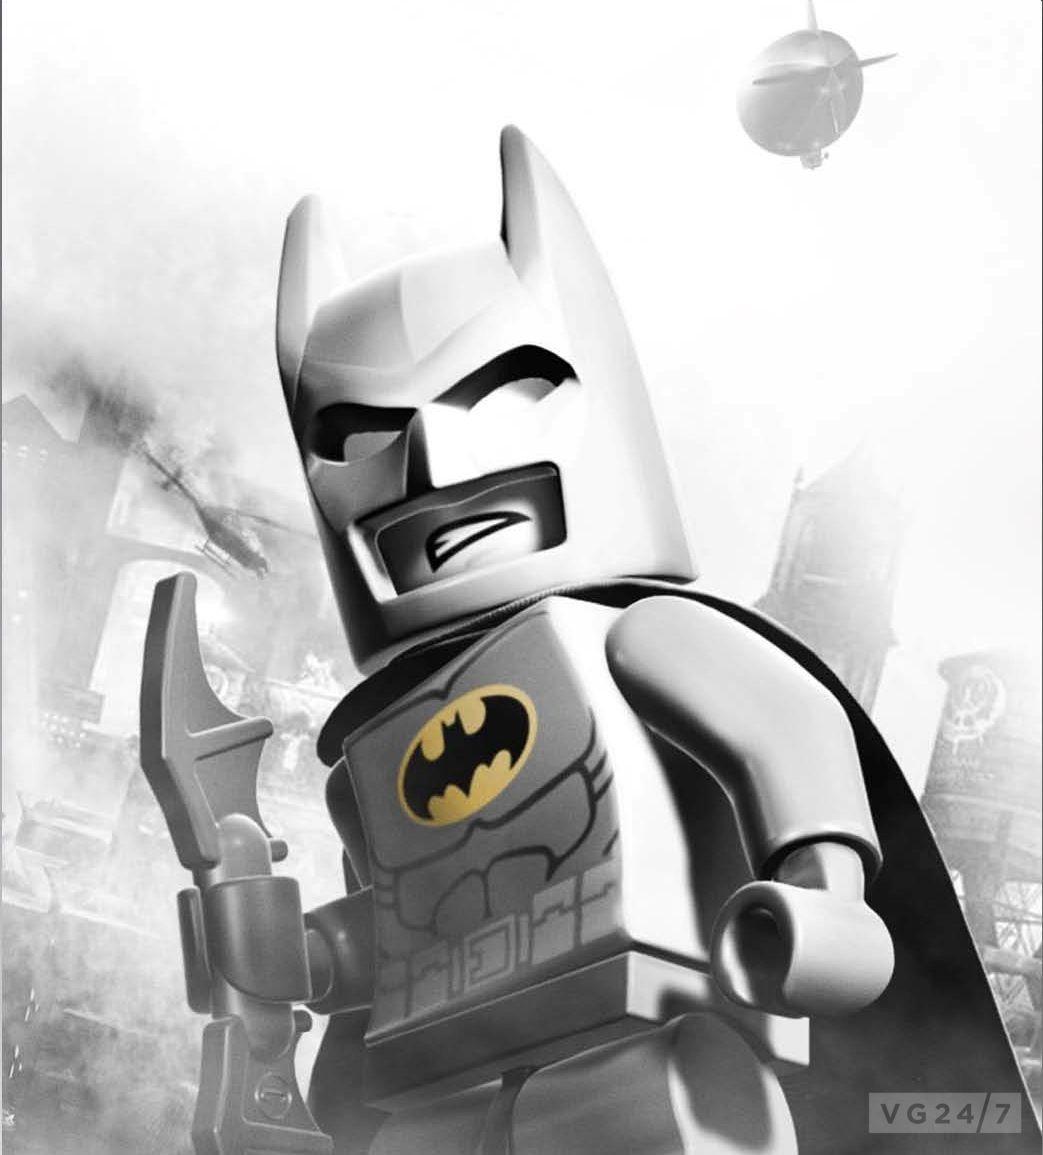 Heroes' Super 'lego 2Dc TeasesLego Batman Via OwXTPZkiu